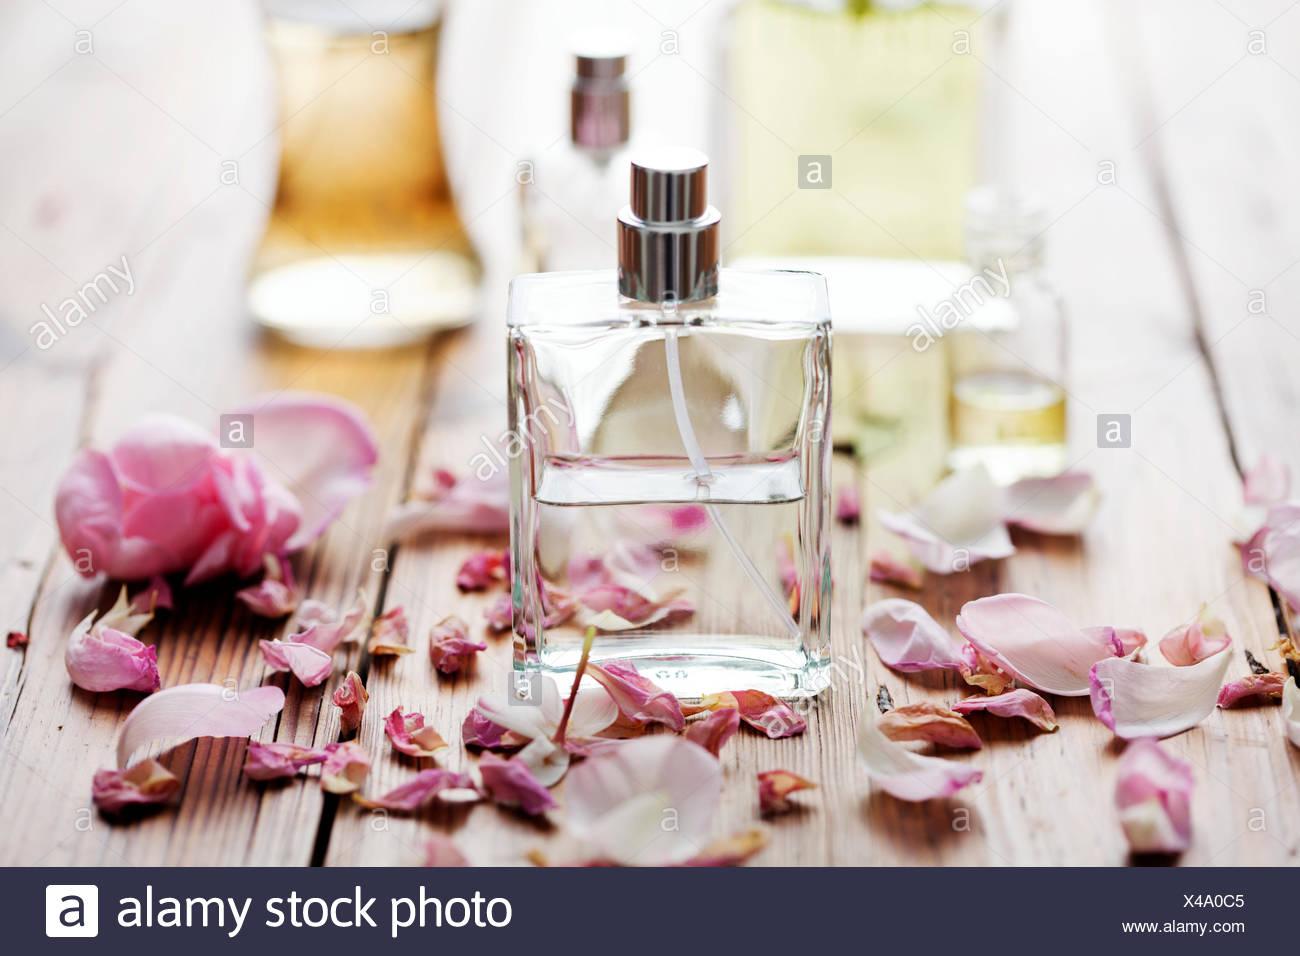 bottle perfume cosmetics - Stock Image